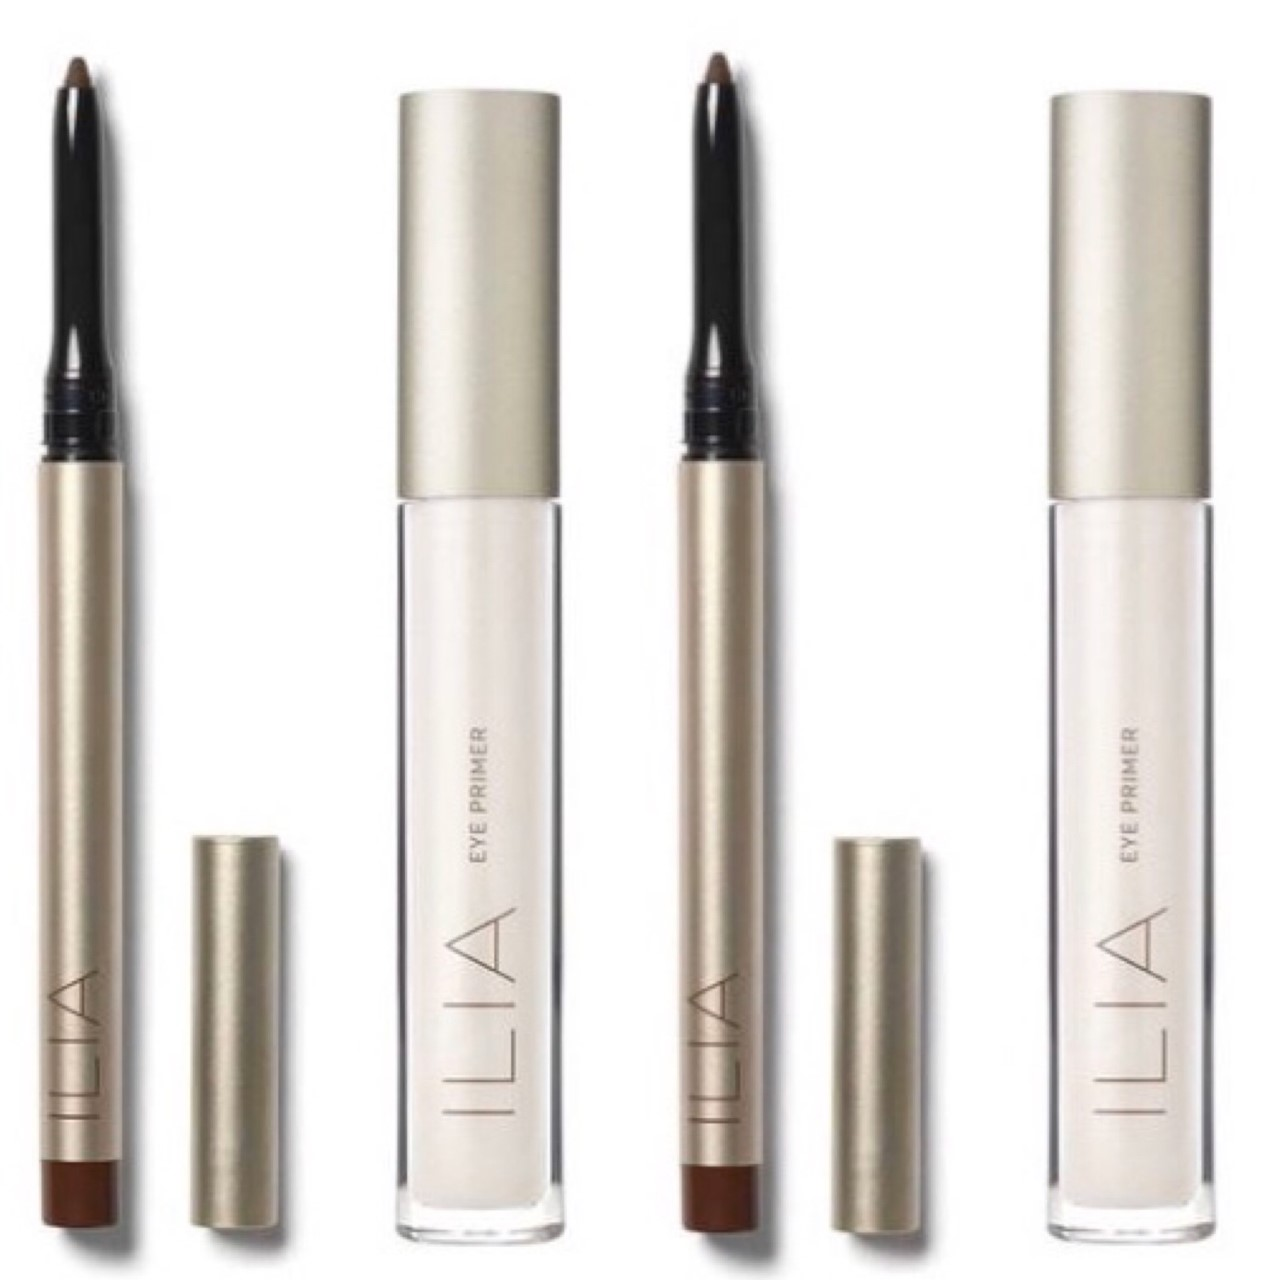 Ilia Clean Line Gel Liner